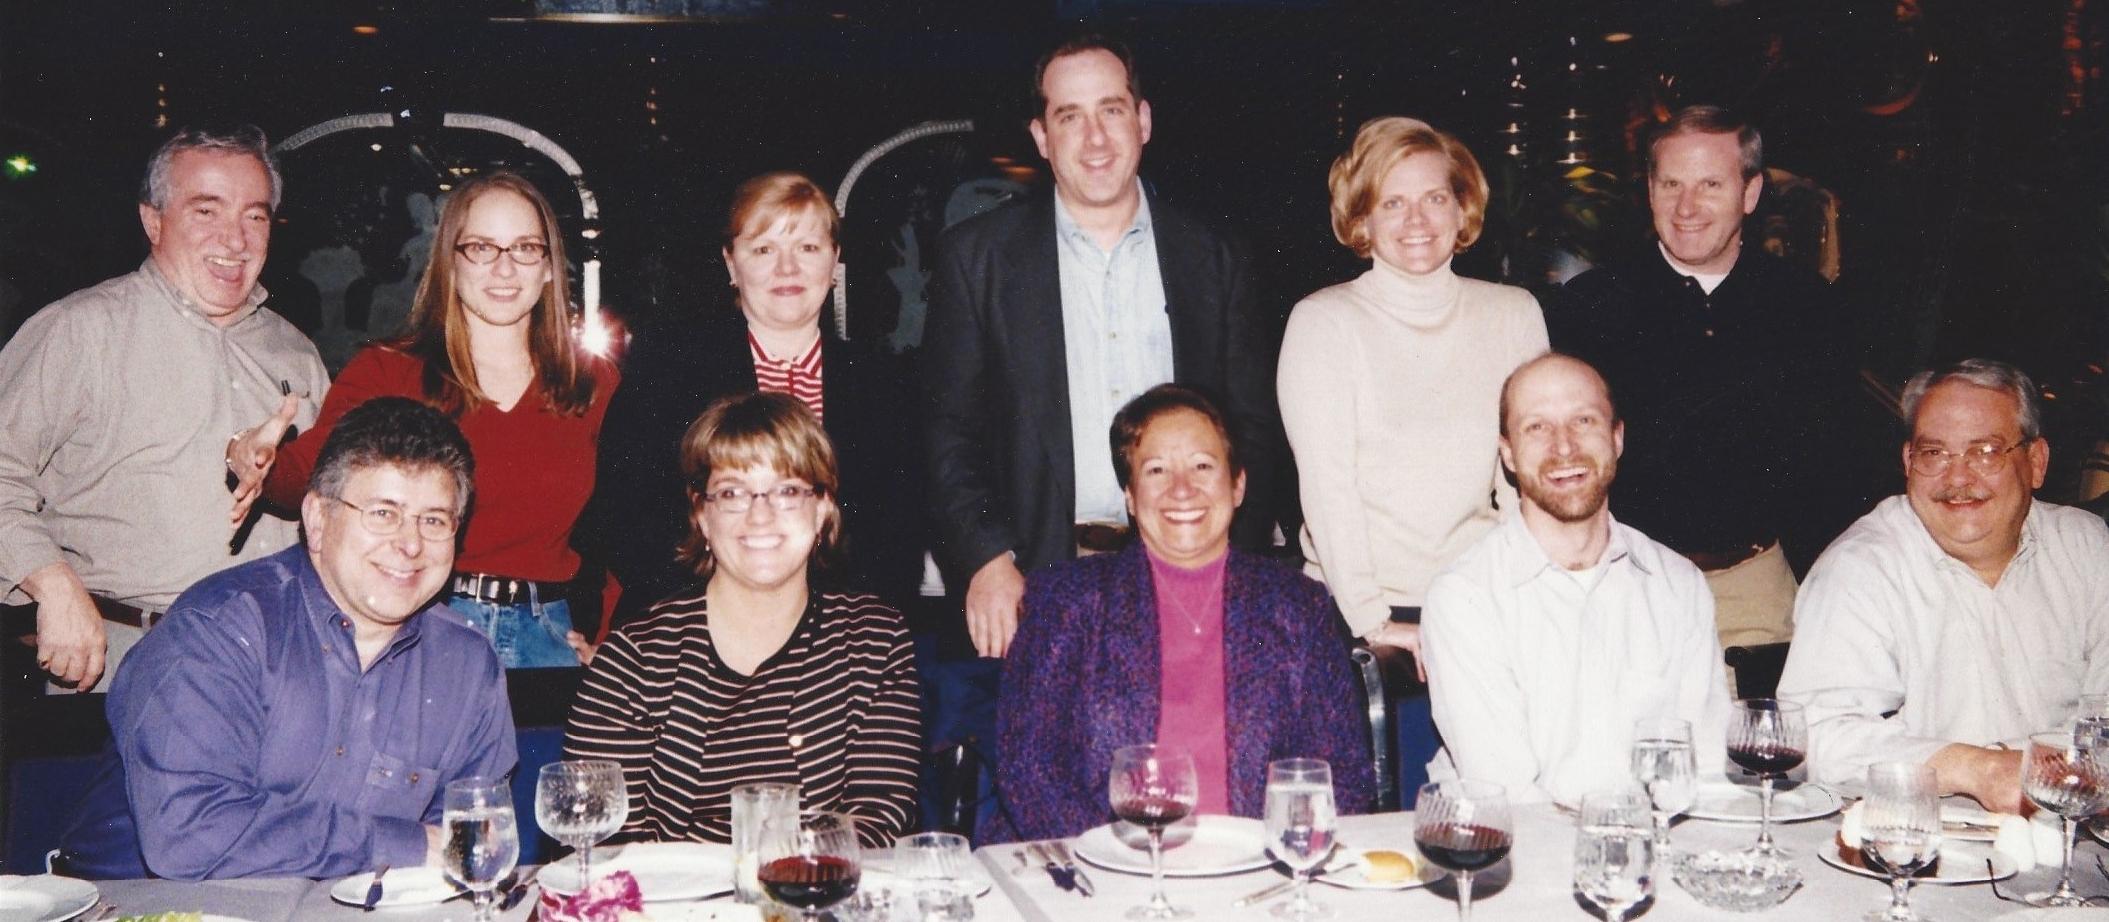 The CDNOW Exec team at an offsite retreat at caesar's atlantic city